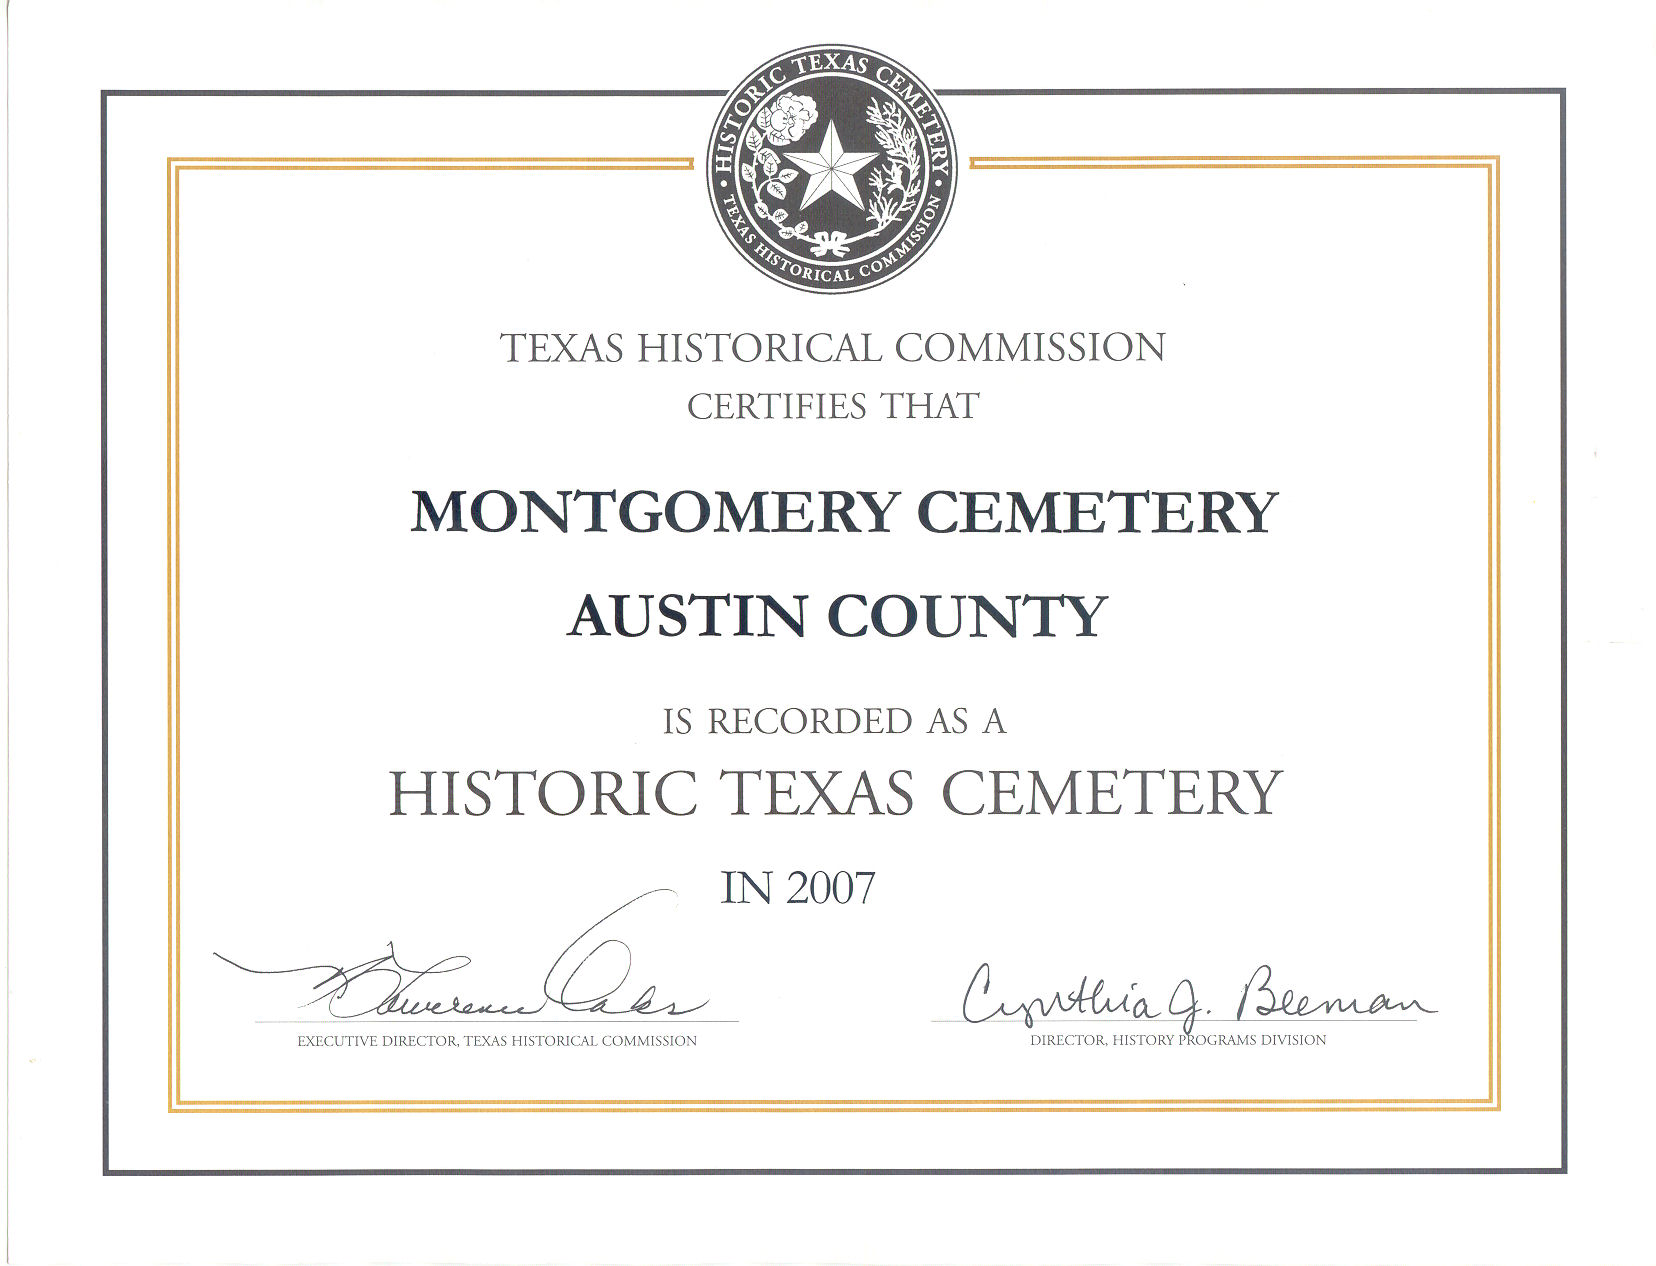 cemetery montgomery certificate bush